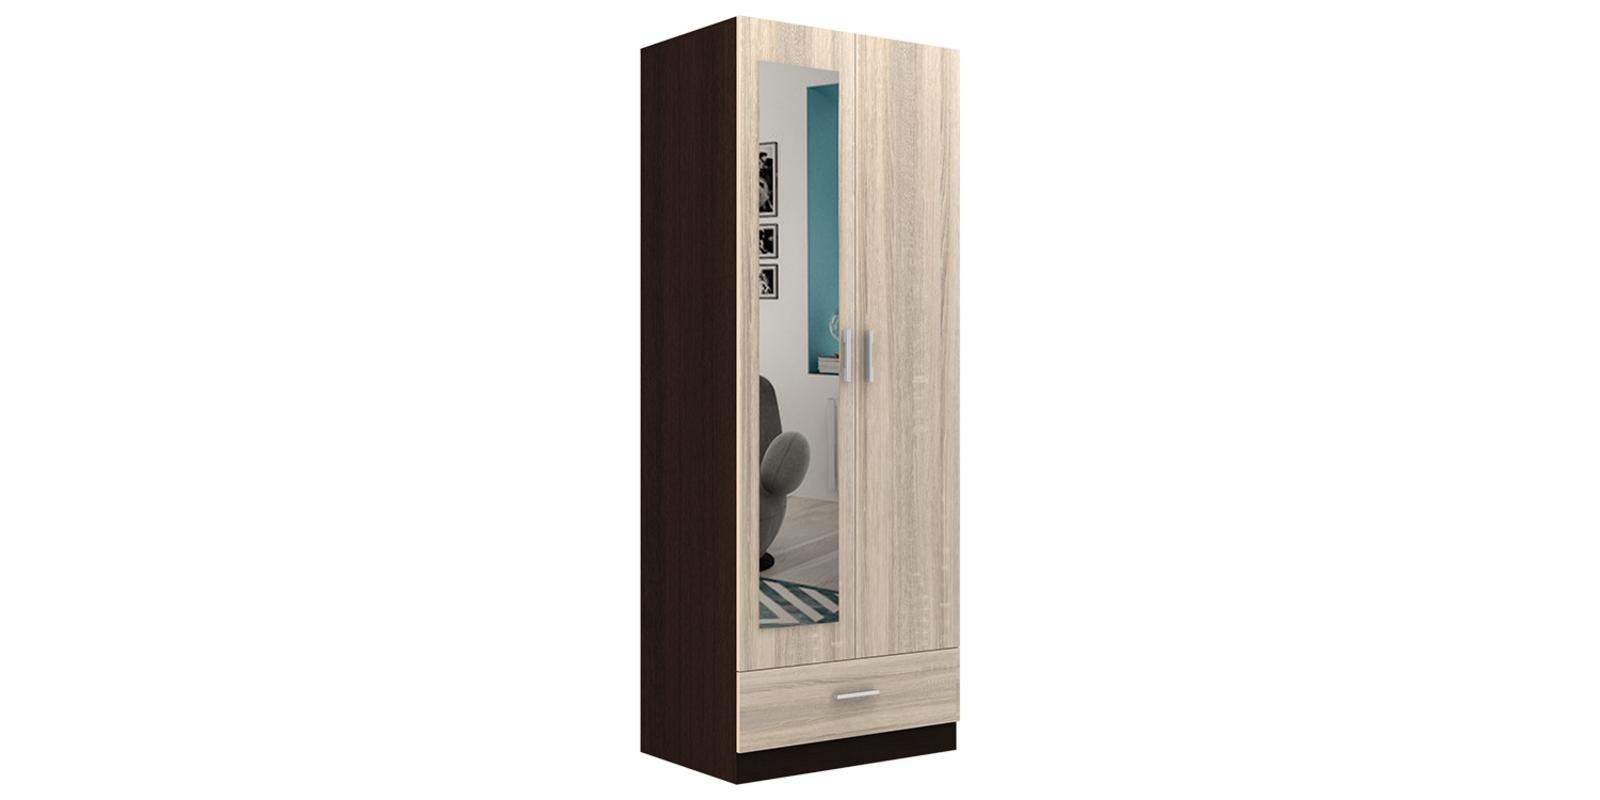 Шкаф распашной двухдверный Мельбурн (дуб феррара/дуб сонома+зеркало)